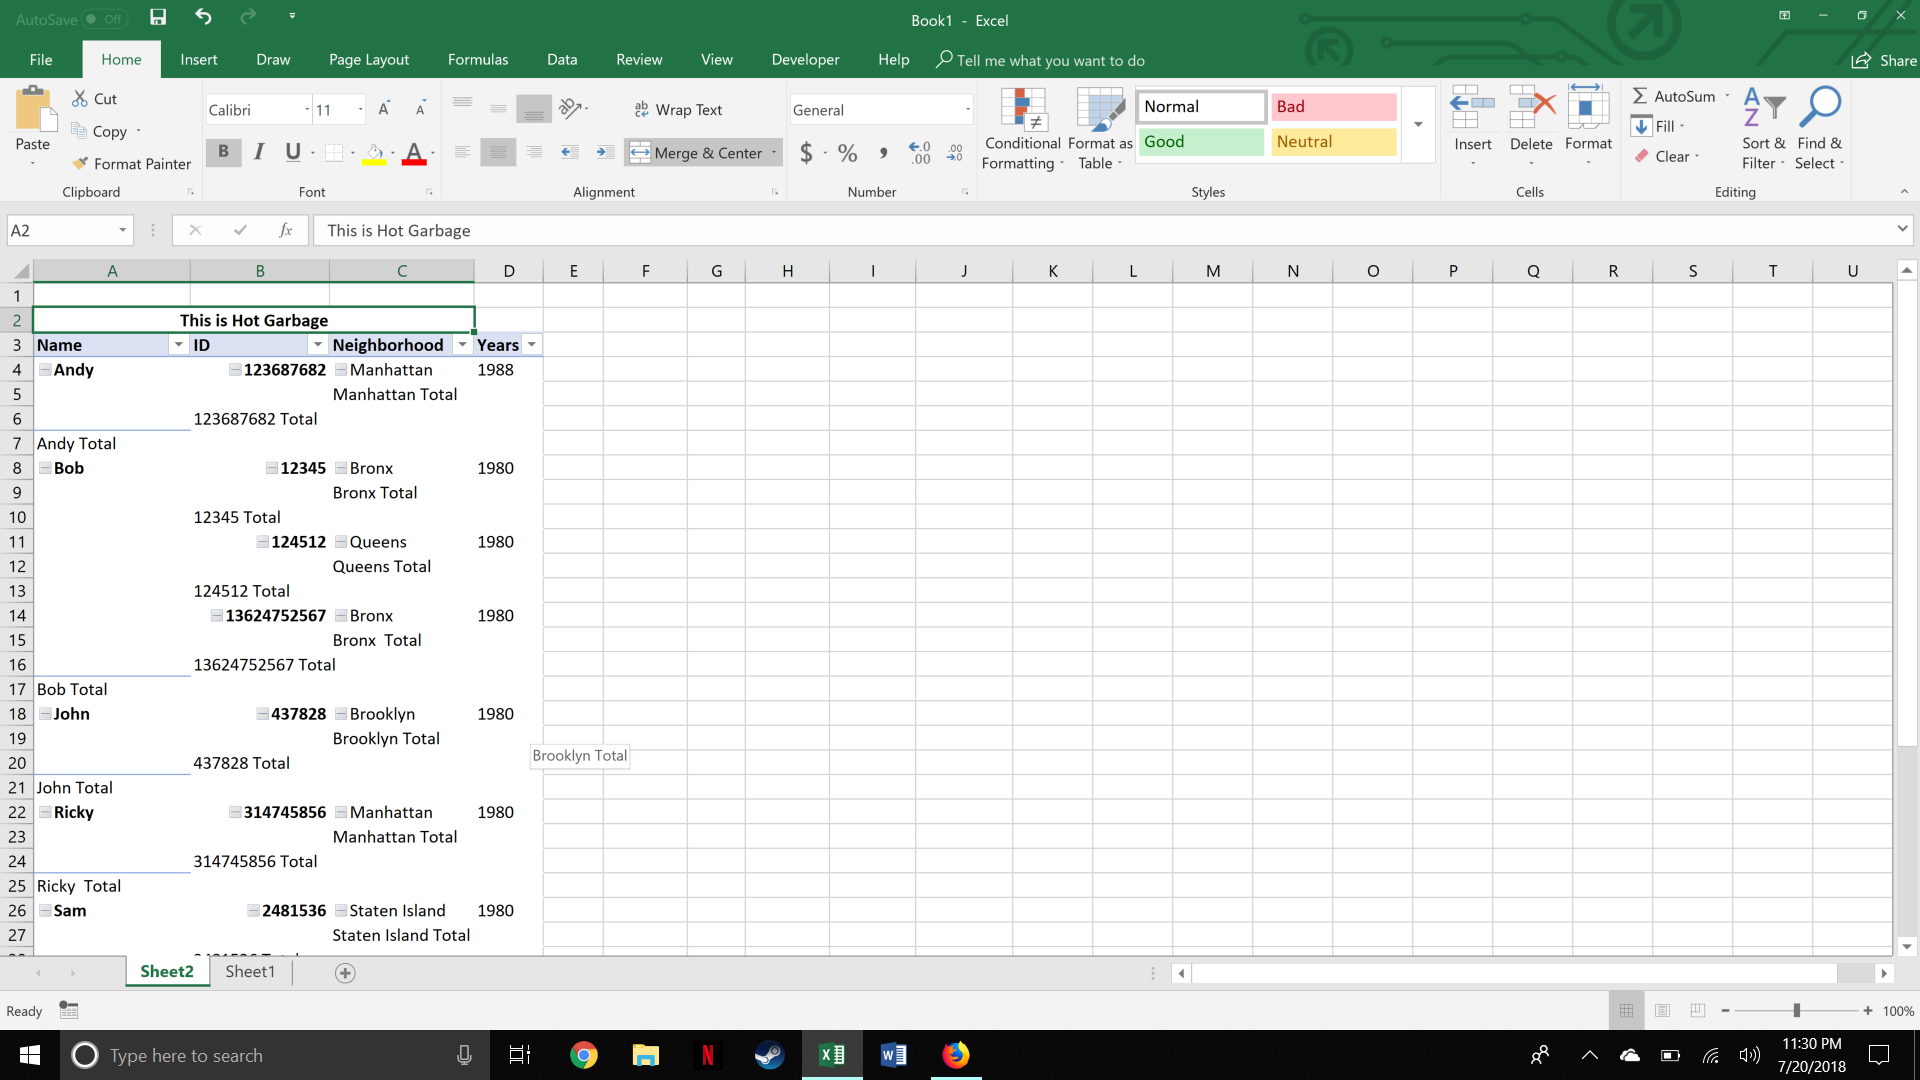 Tabular format layout